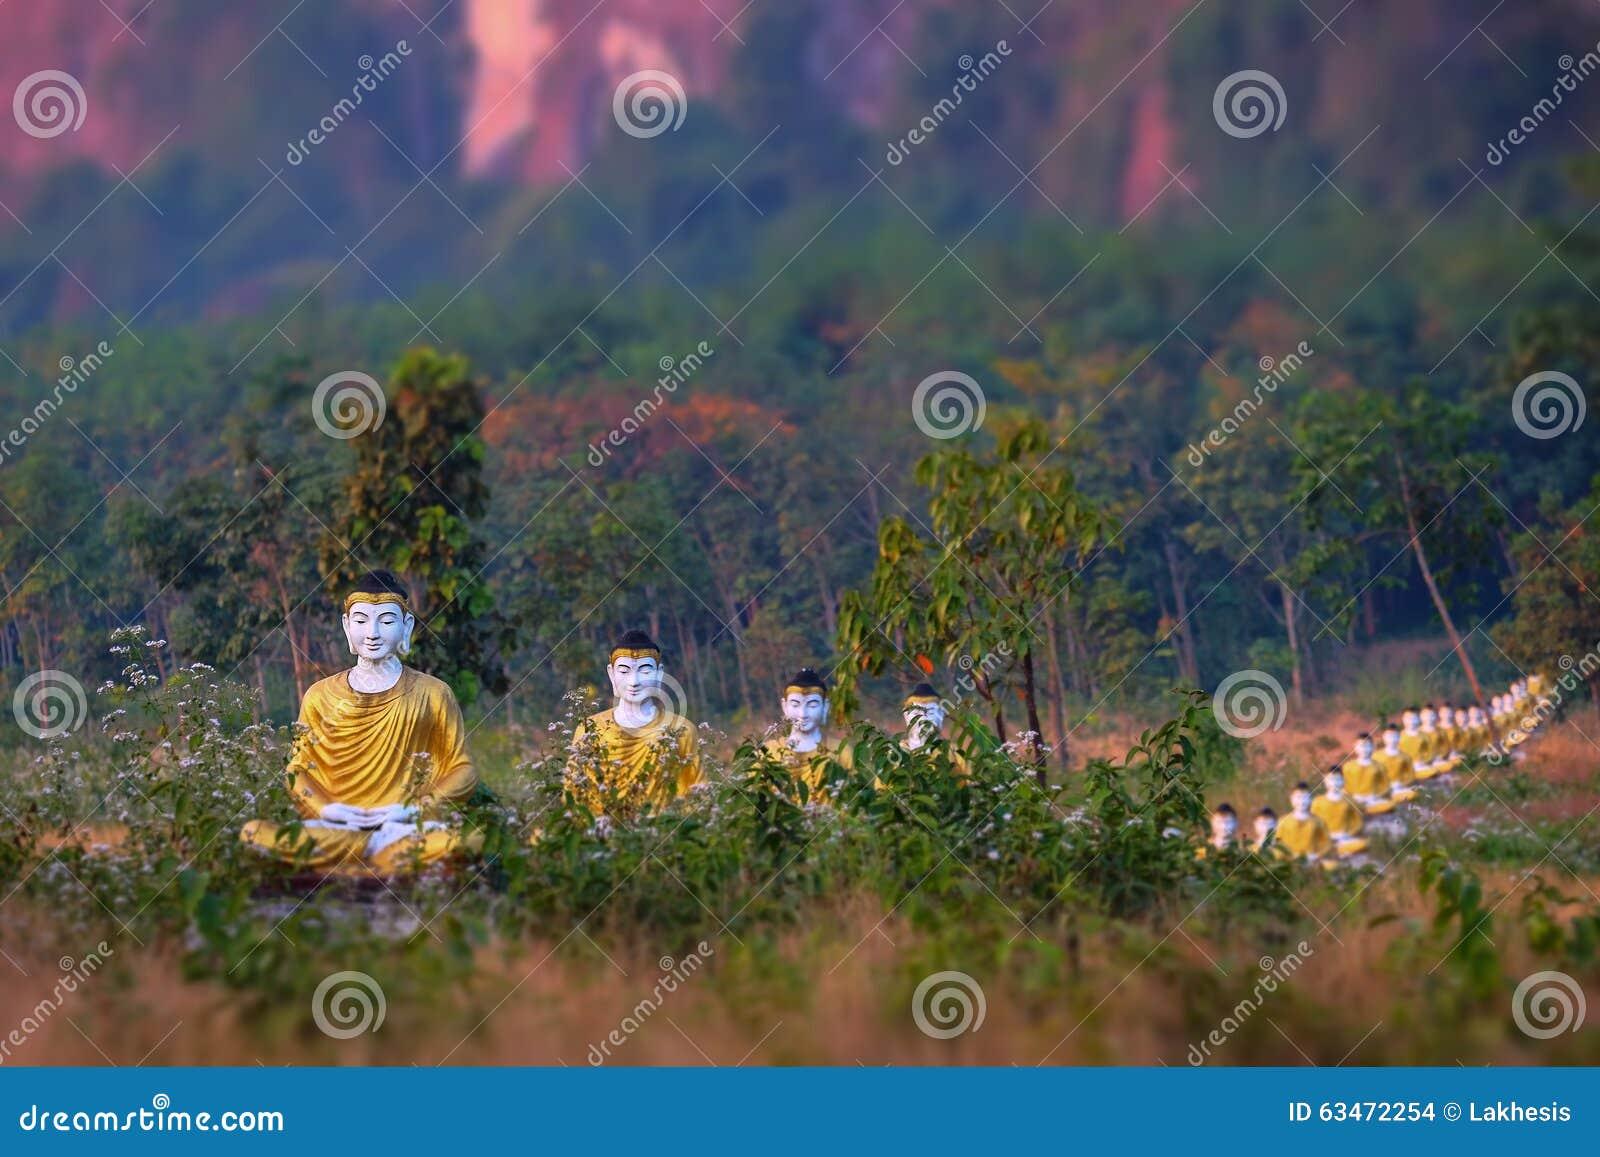 Статуи Buddhas серии в саде Loumani Будды Hpa-An, Мьянма (